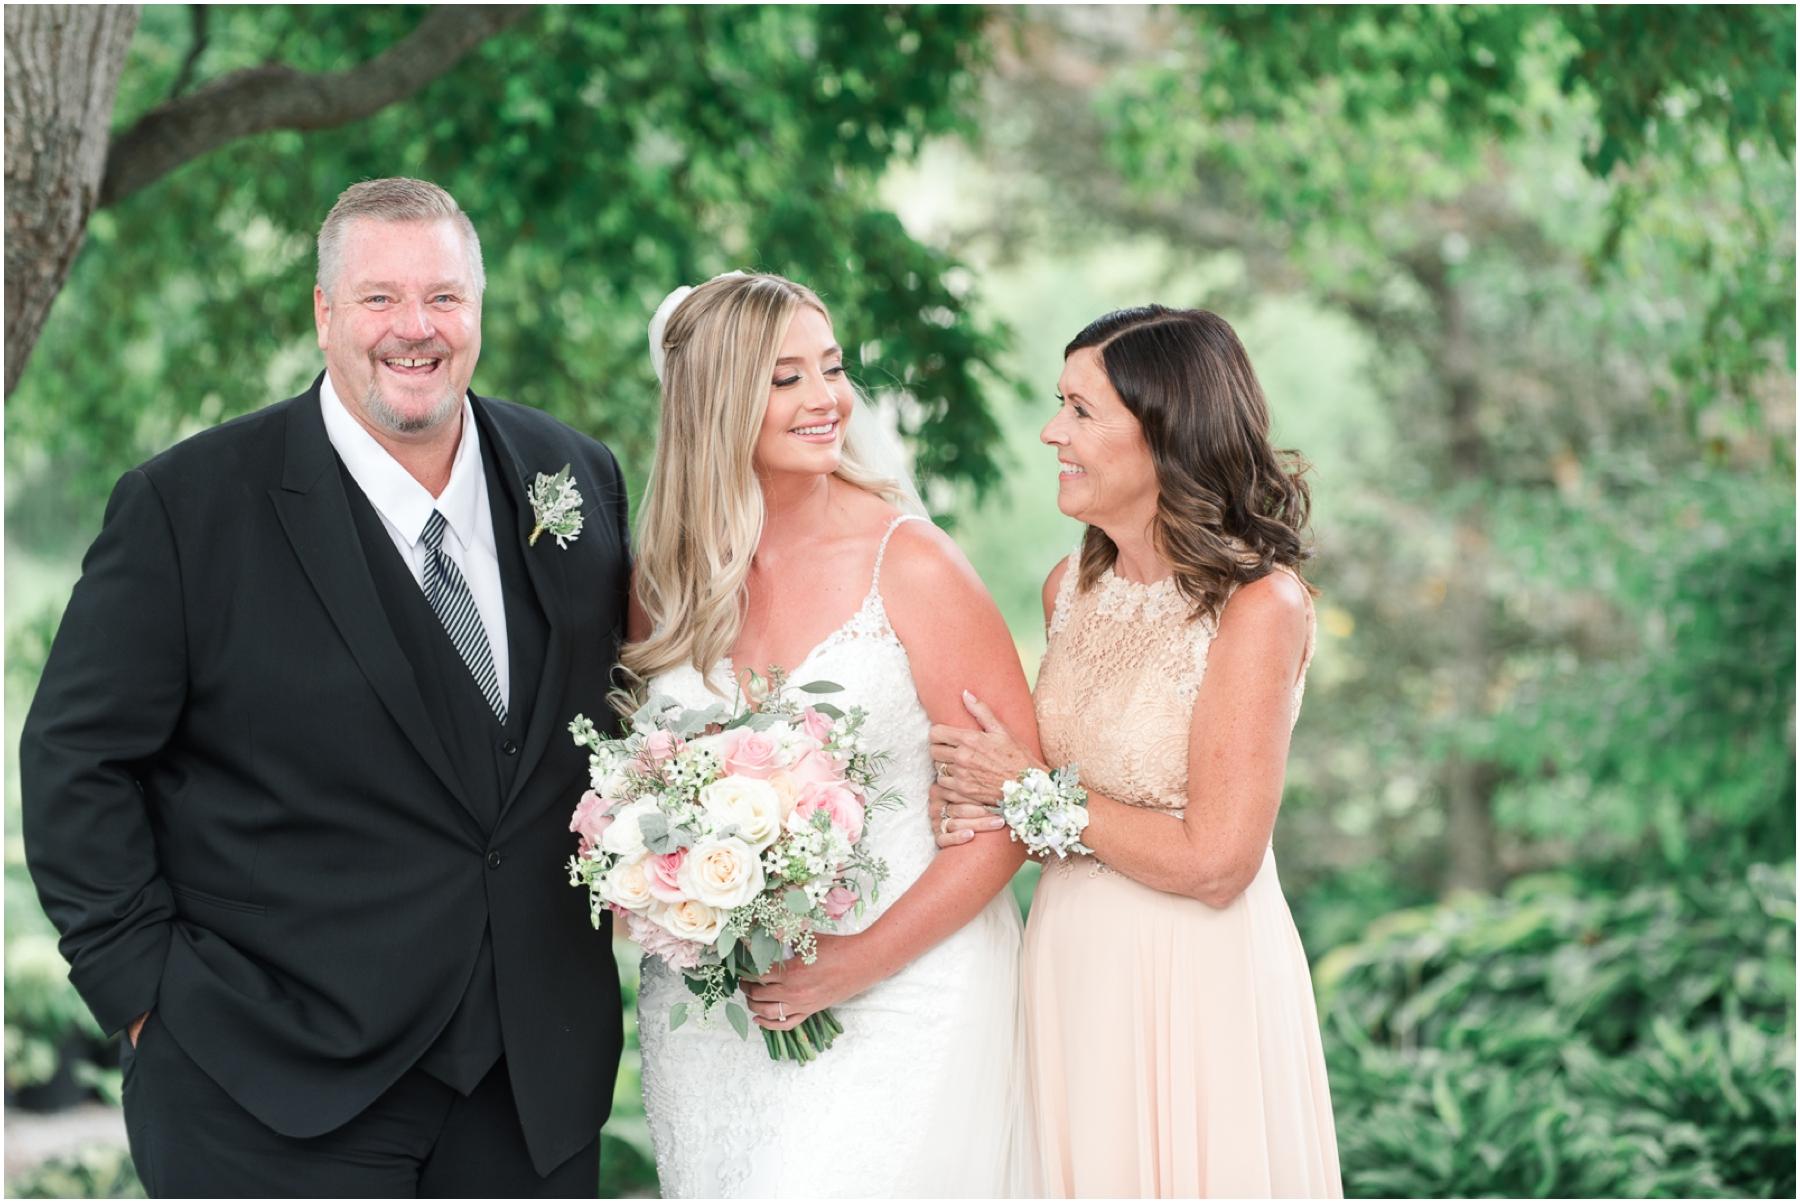 Bloom Field Gardens Wedding Precious Photography Katherine & Chris_024